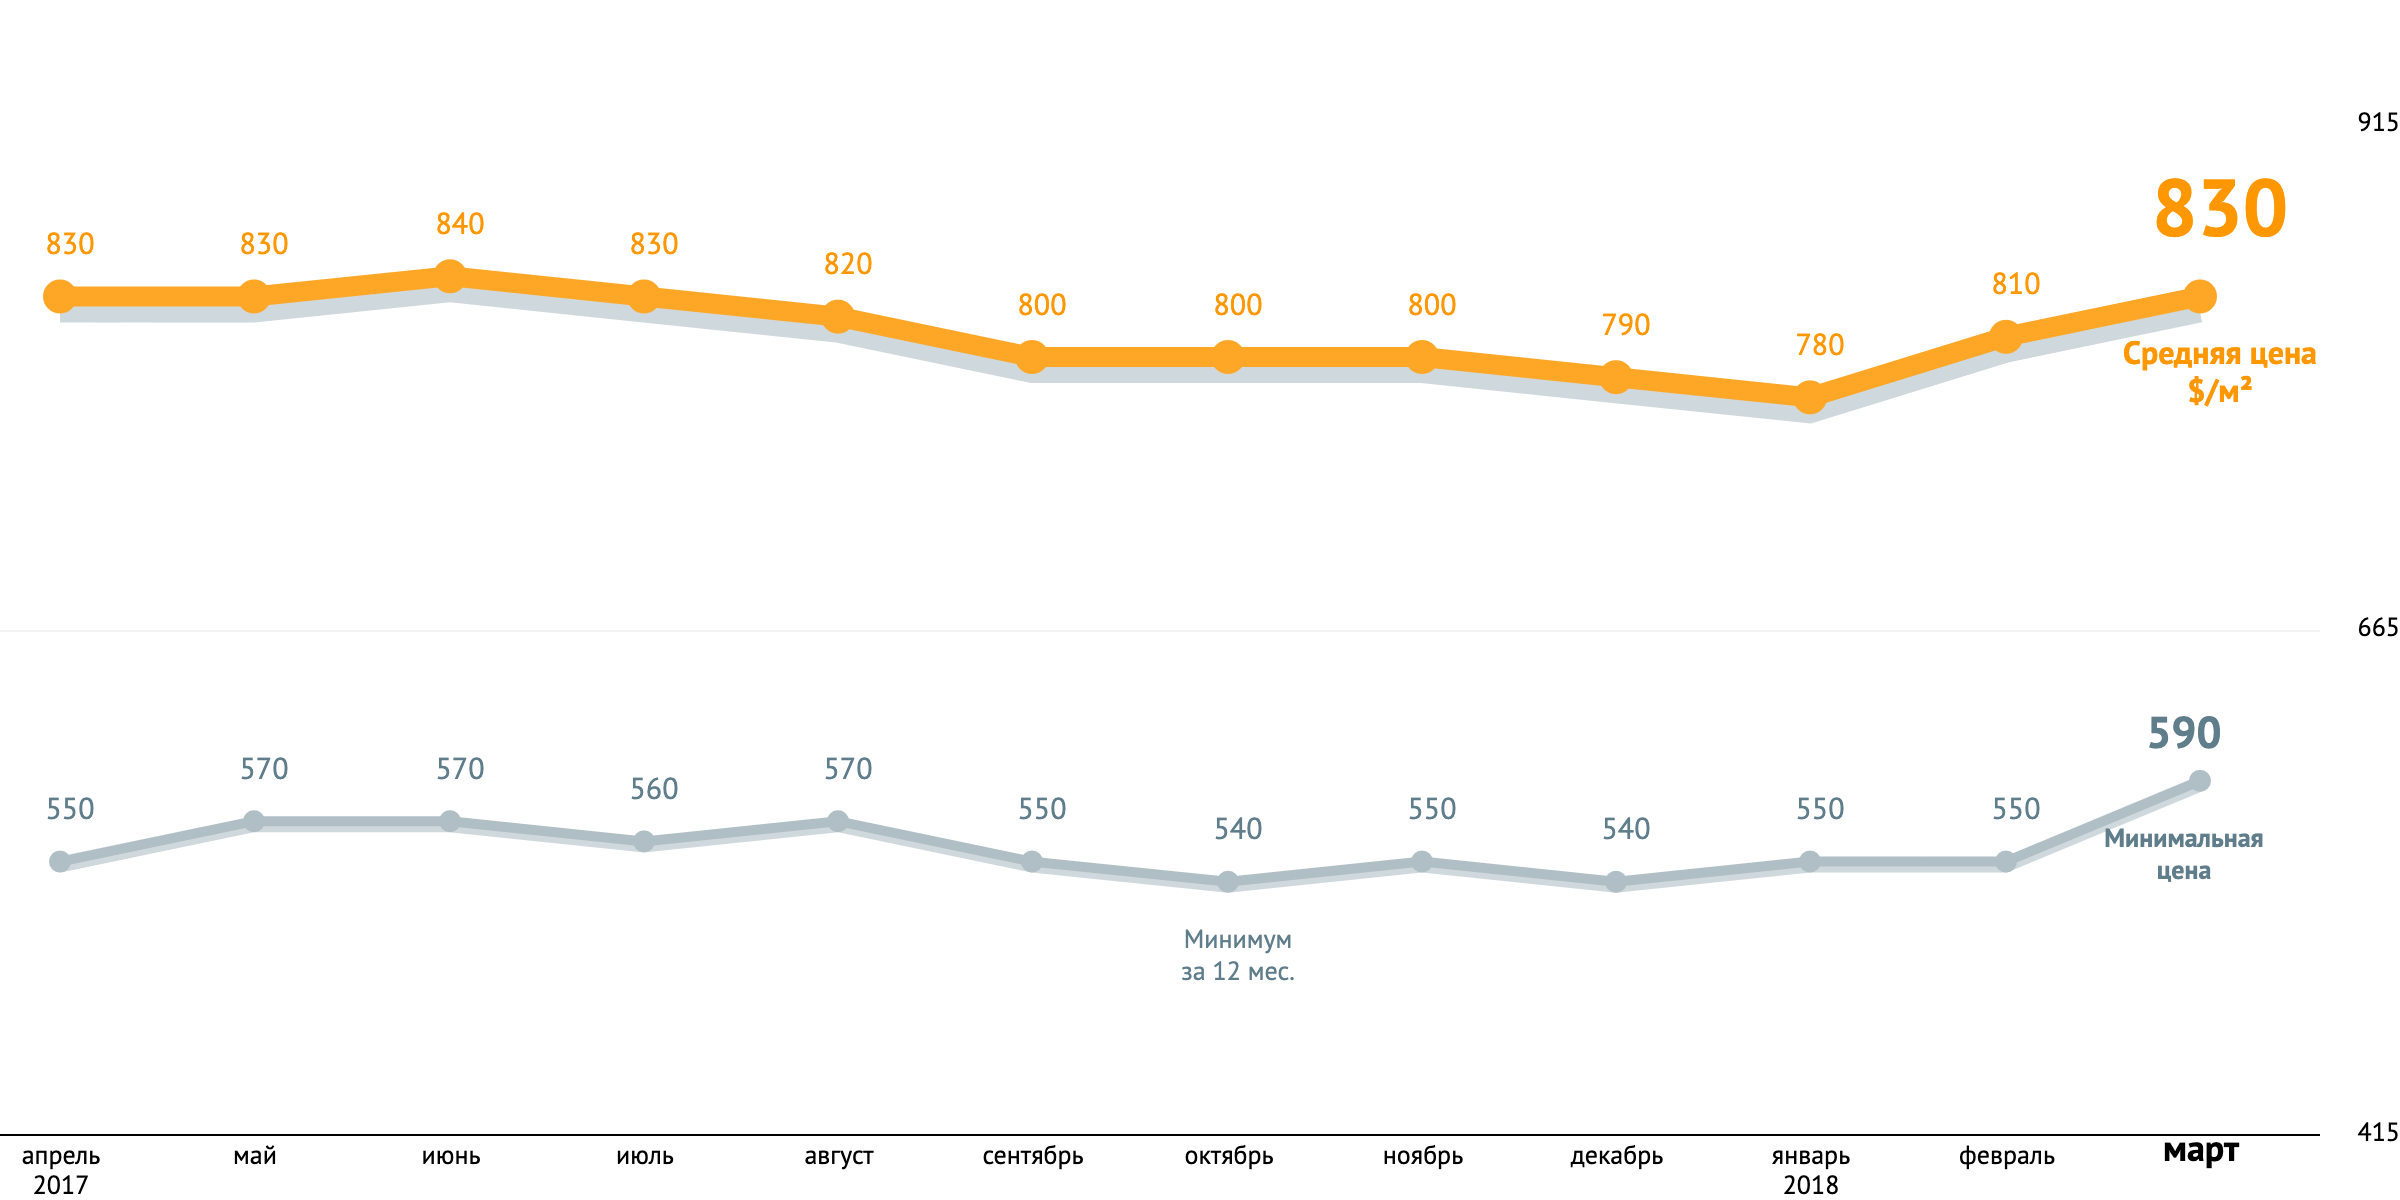 динамика средних цен за квадратный метро в новостройках март 2018